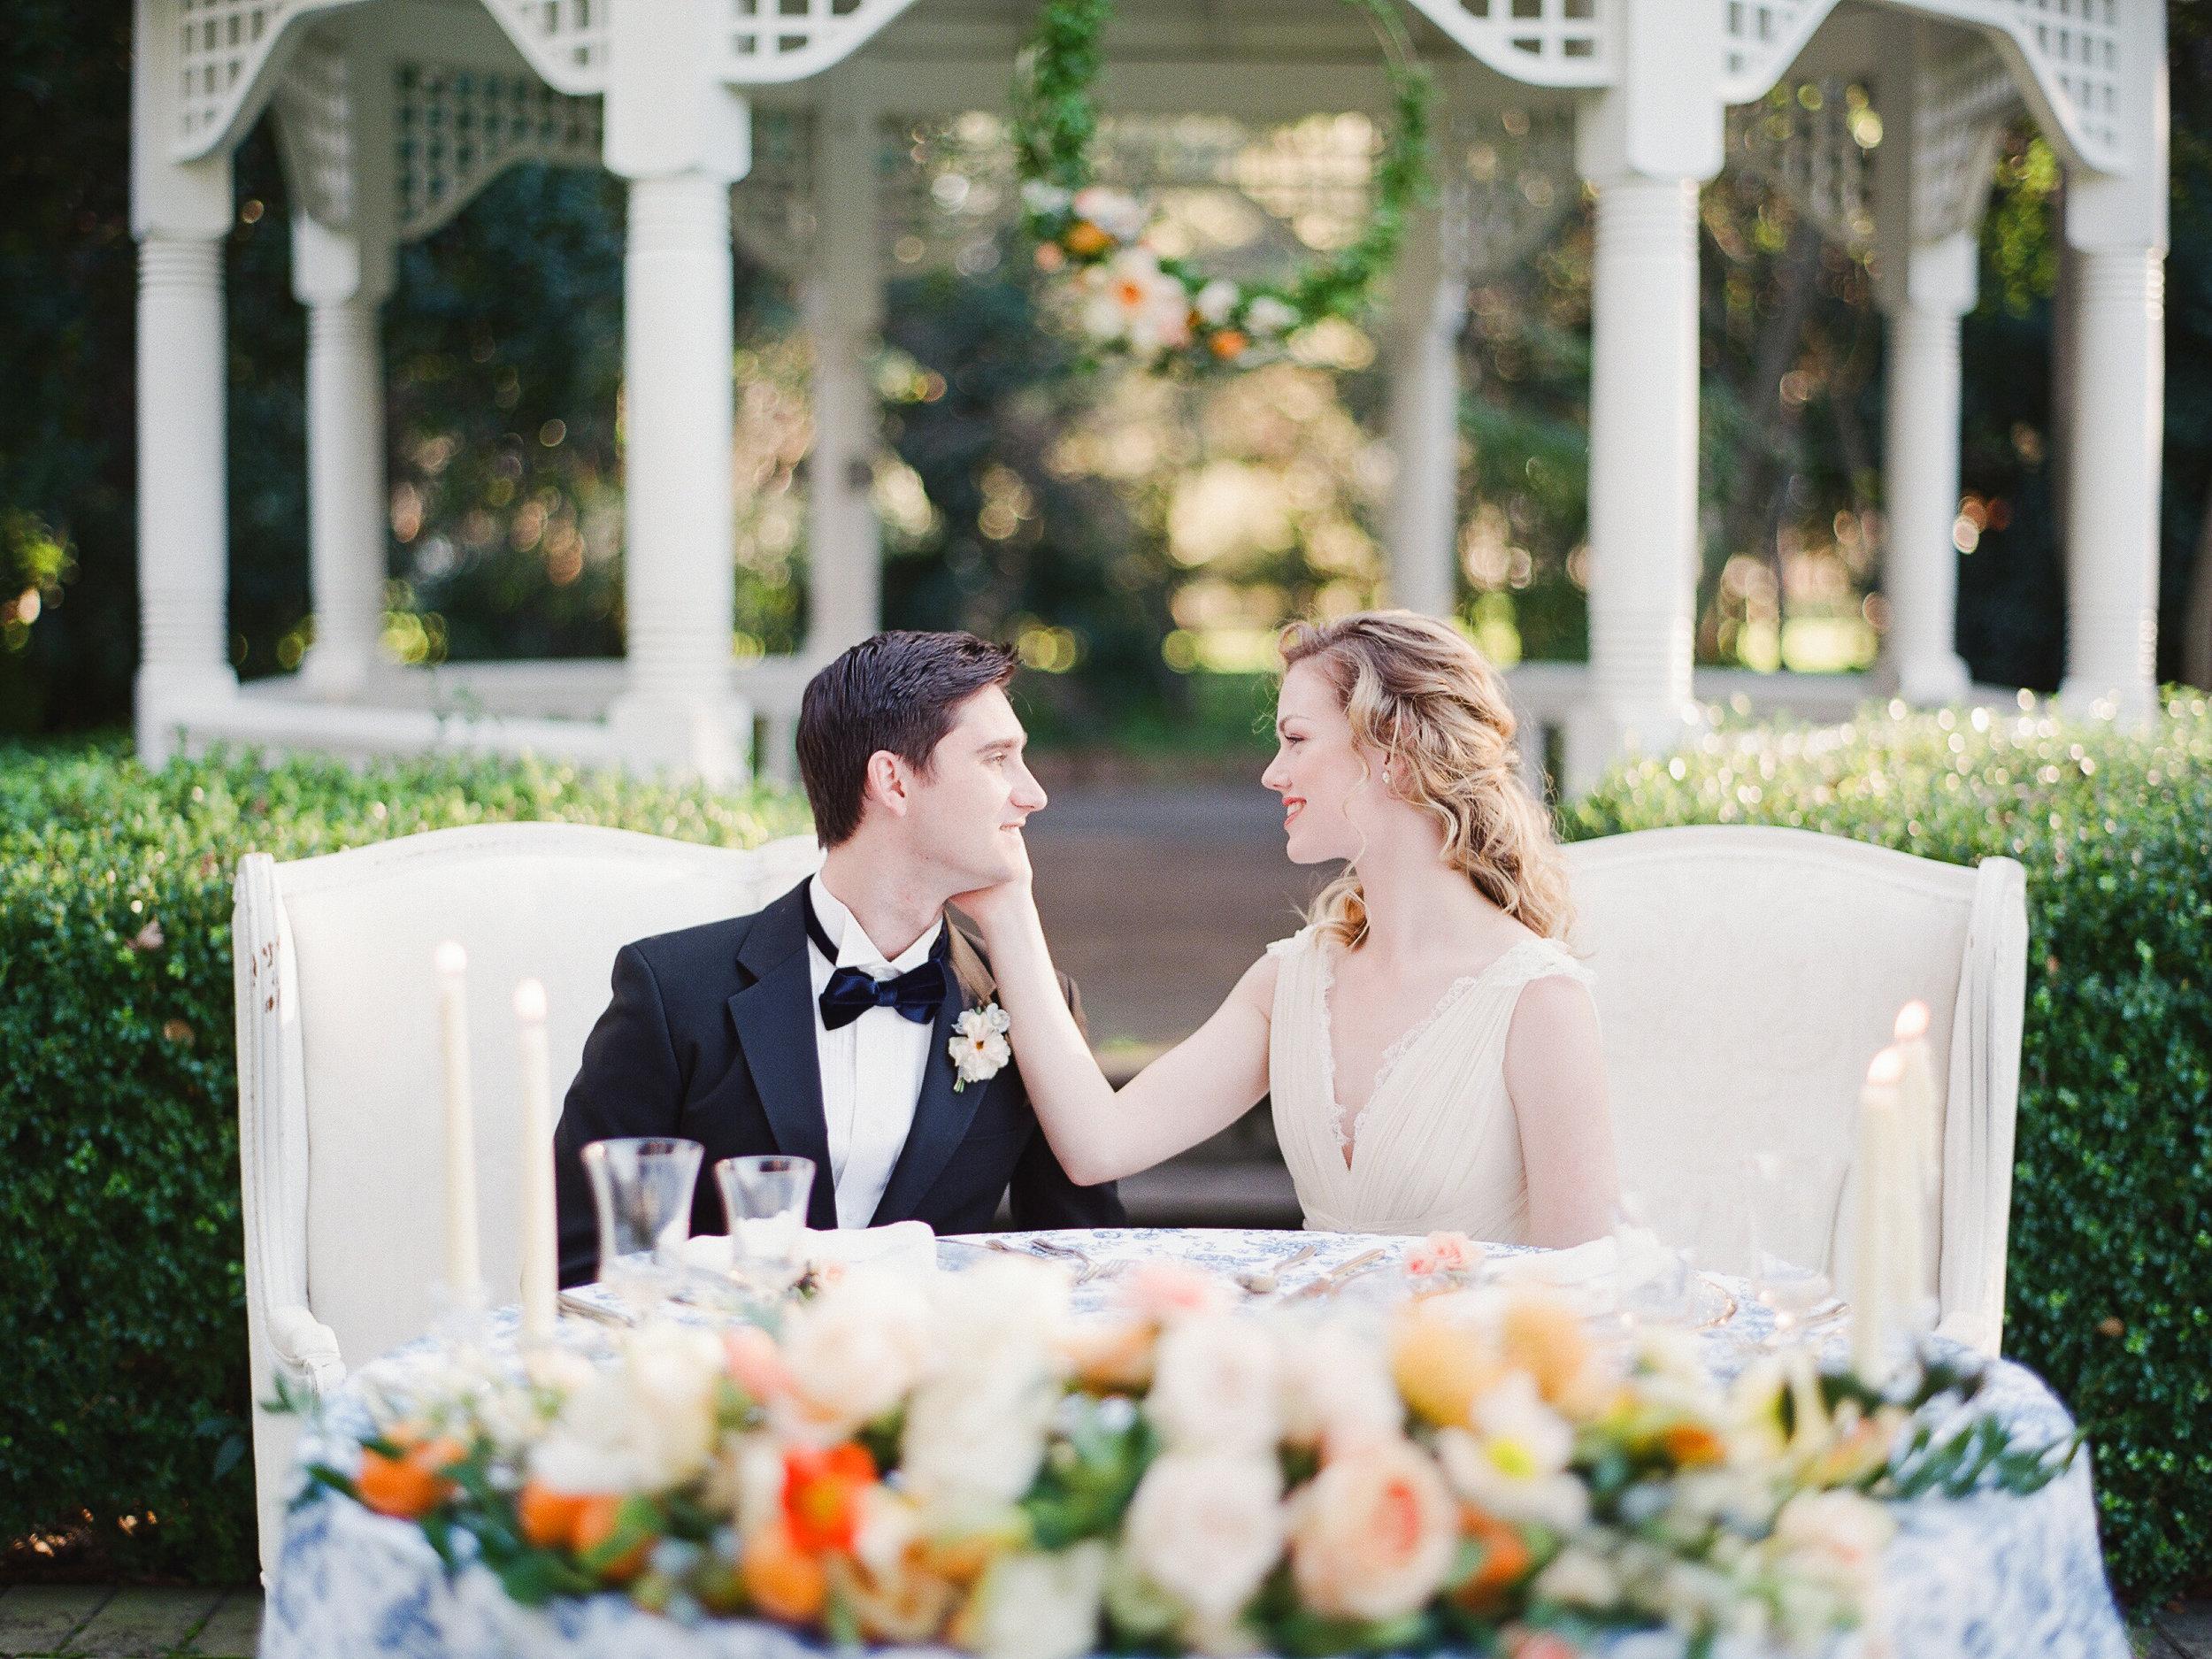 radostinaboseva-garden-wedding-141.jpg